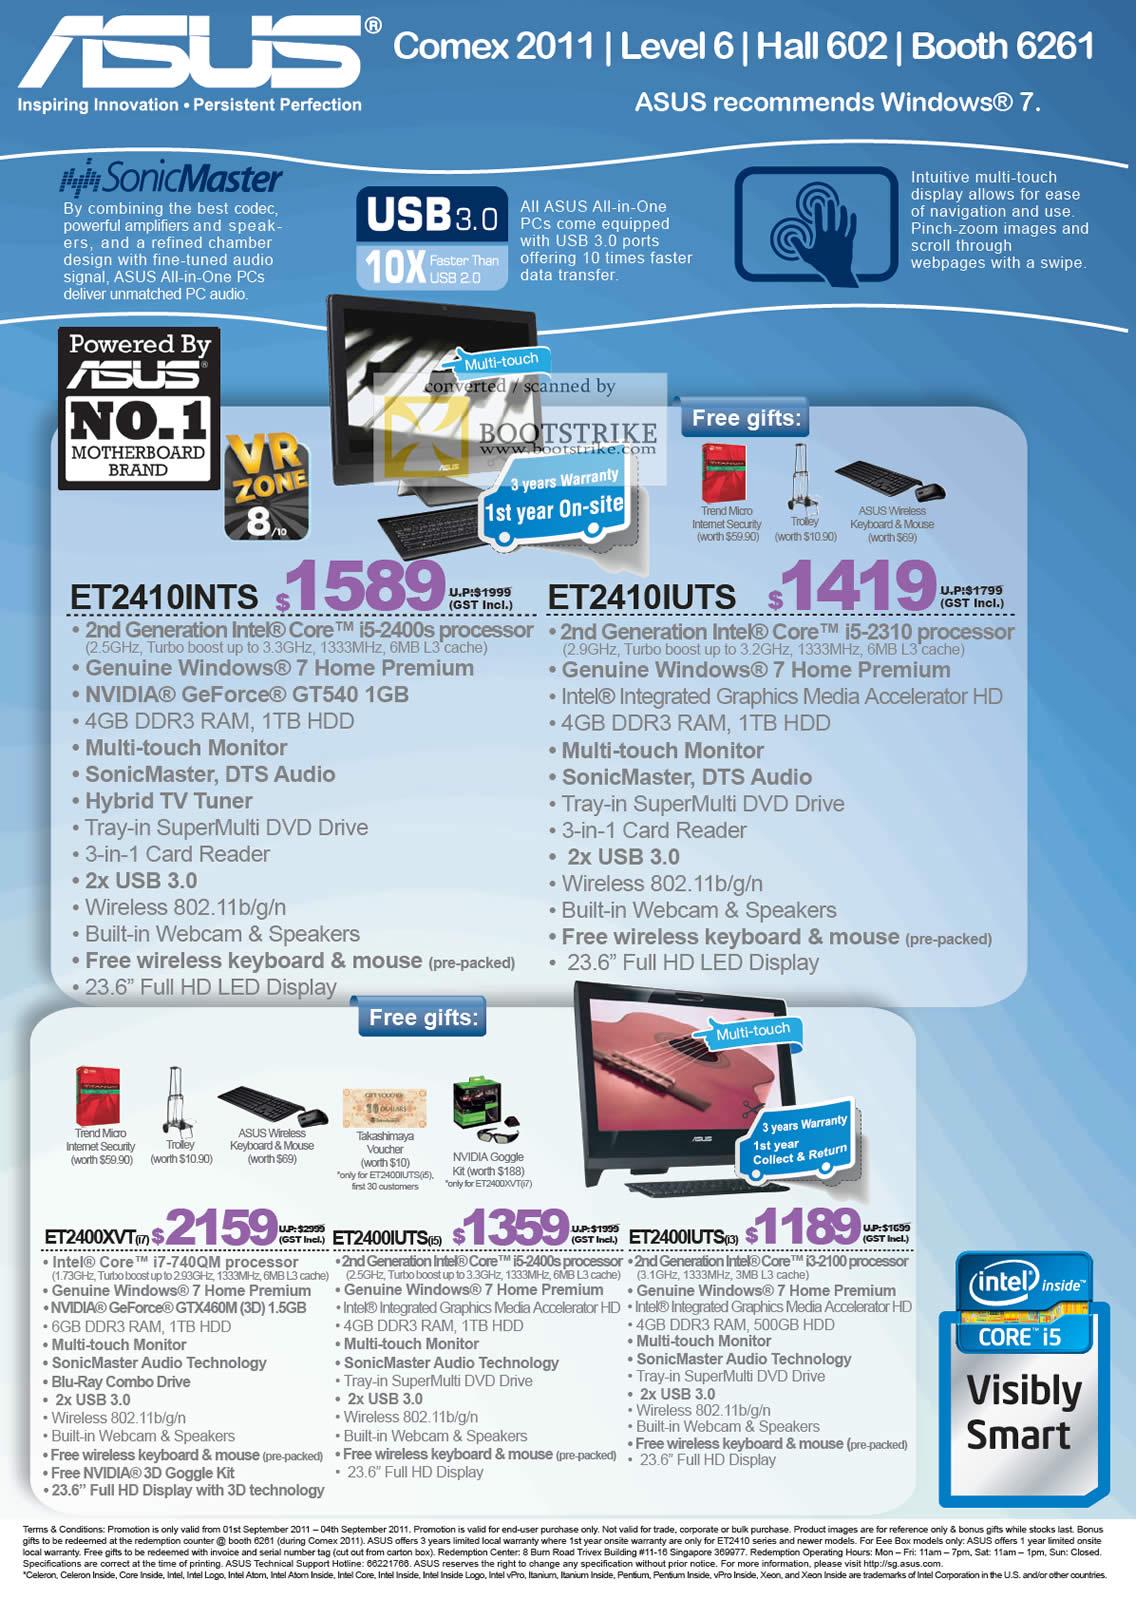 COMEX 2011 price list image brochure of ASUS Desktop PC AIO ET2410INTS ET2410IUTS ET2400XVT ET2400IUTS